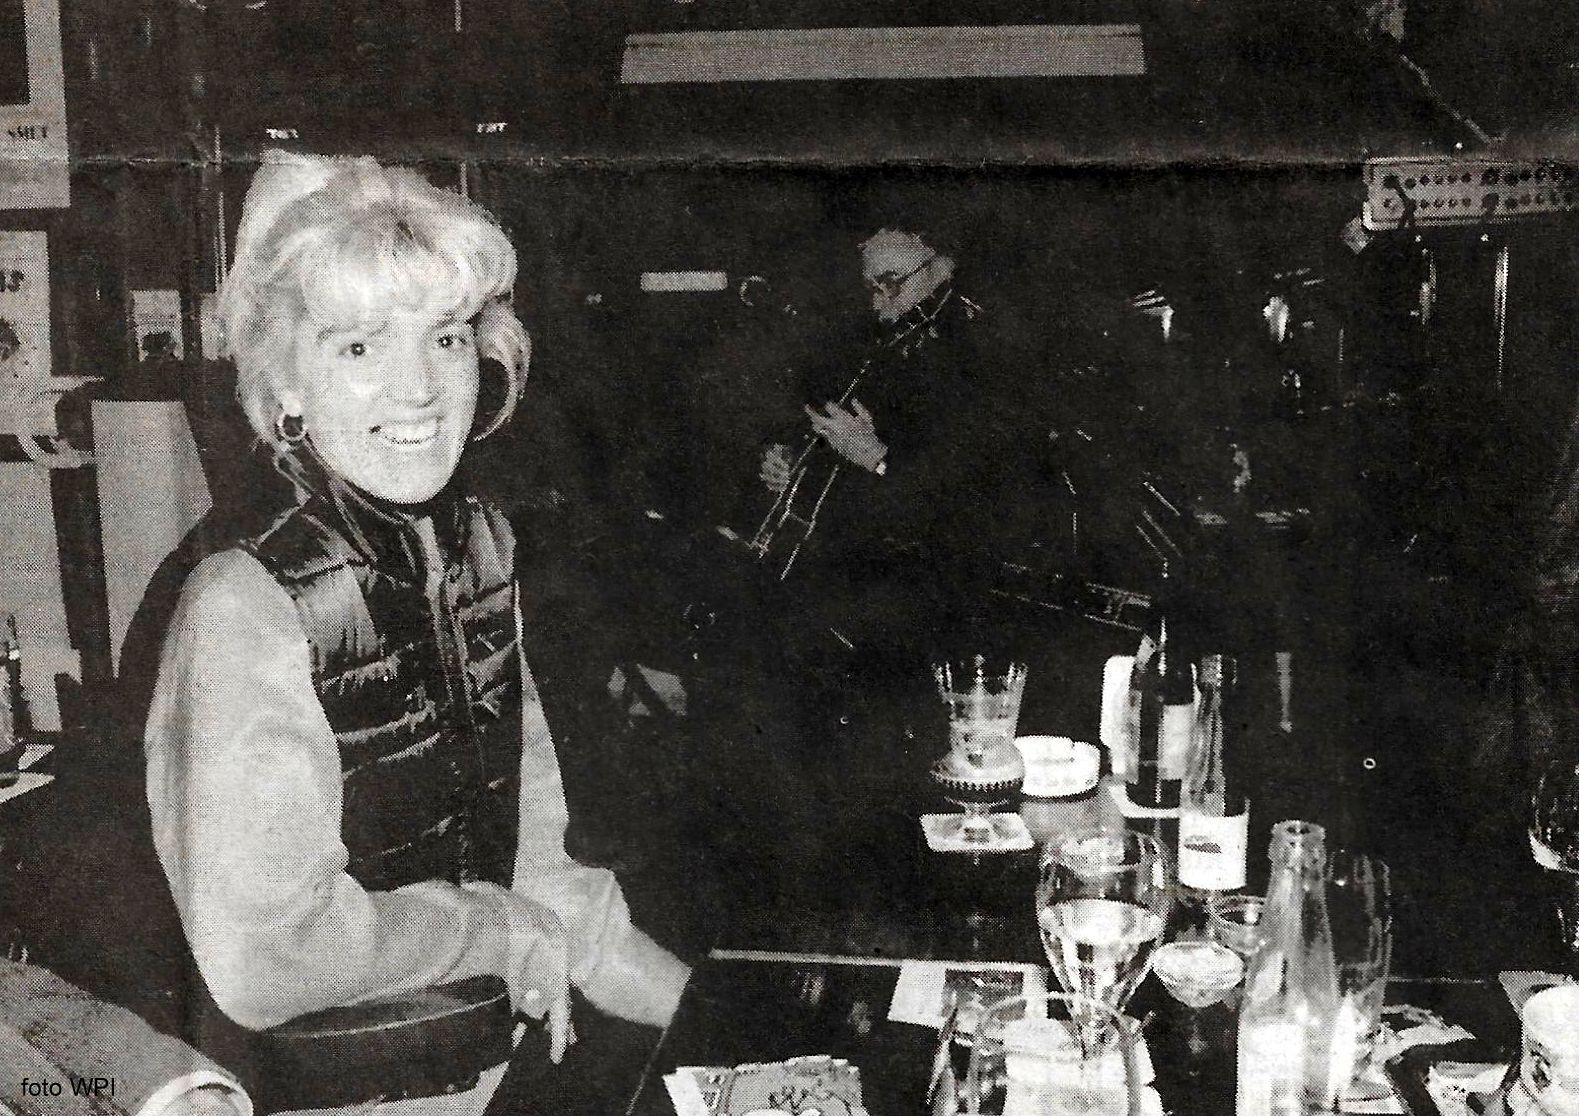 Andie MacDowell (1987)Photo Credit: Ian Miles_Shooting Star™